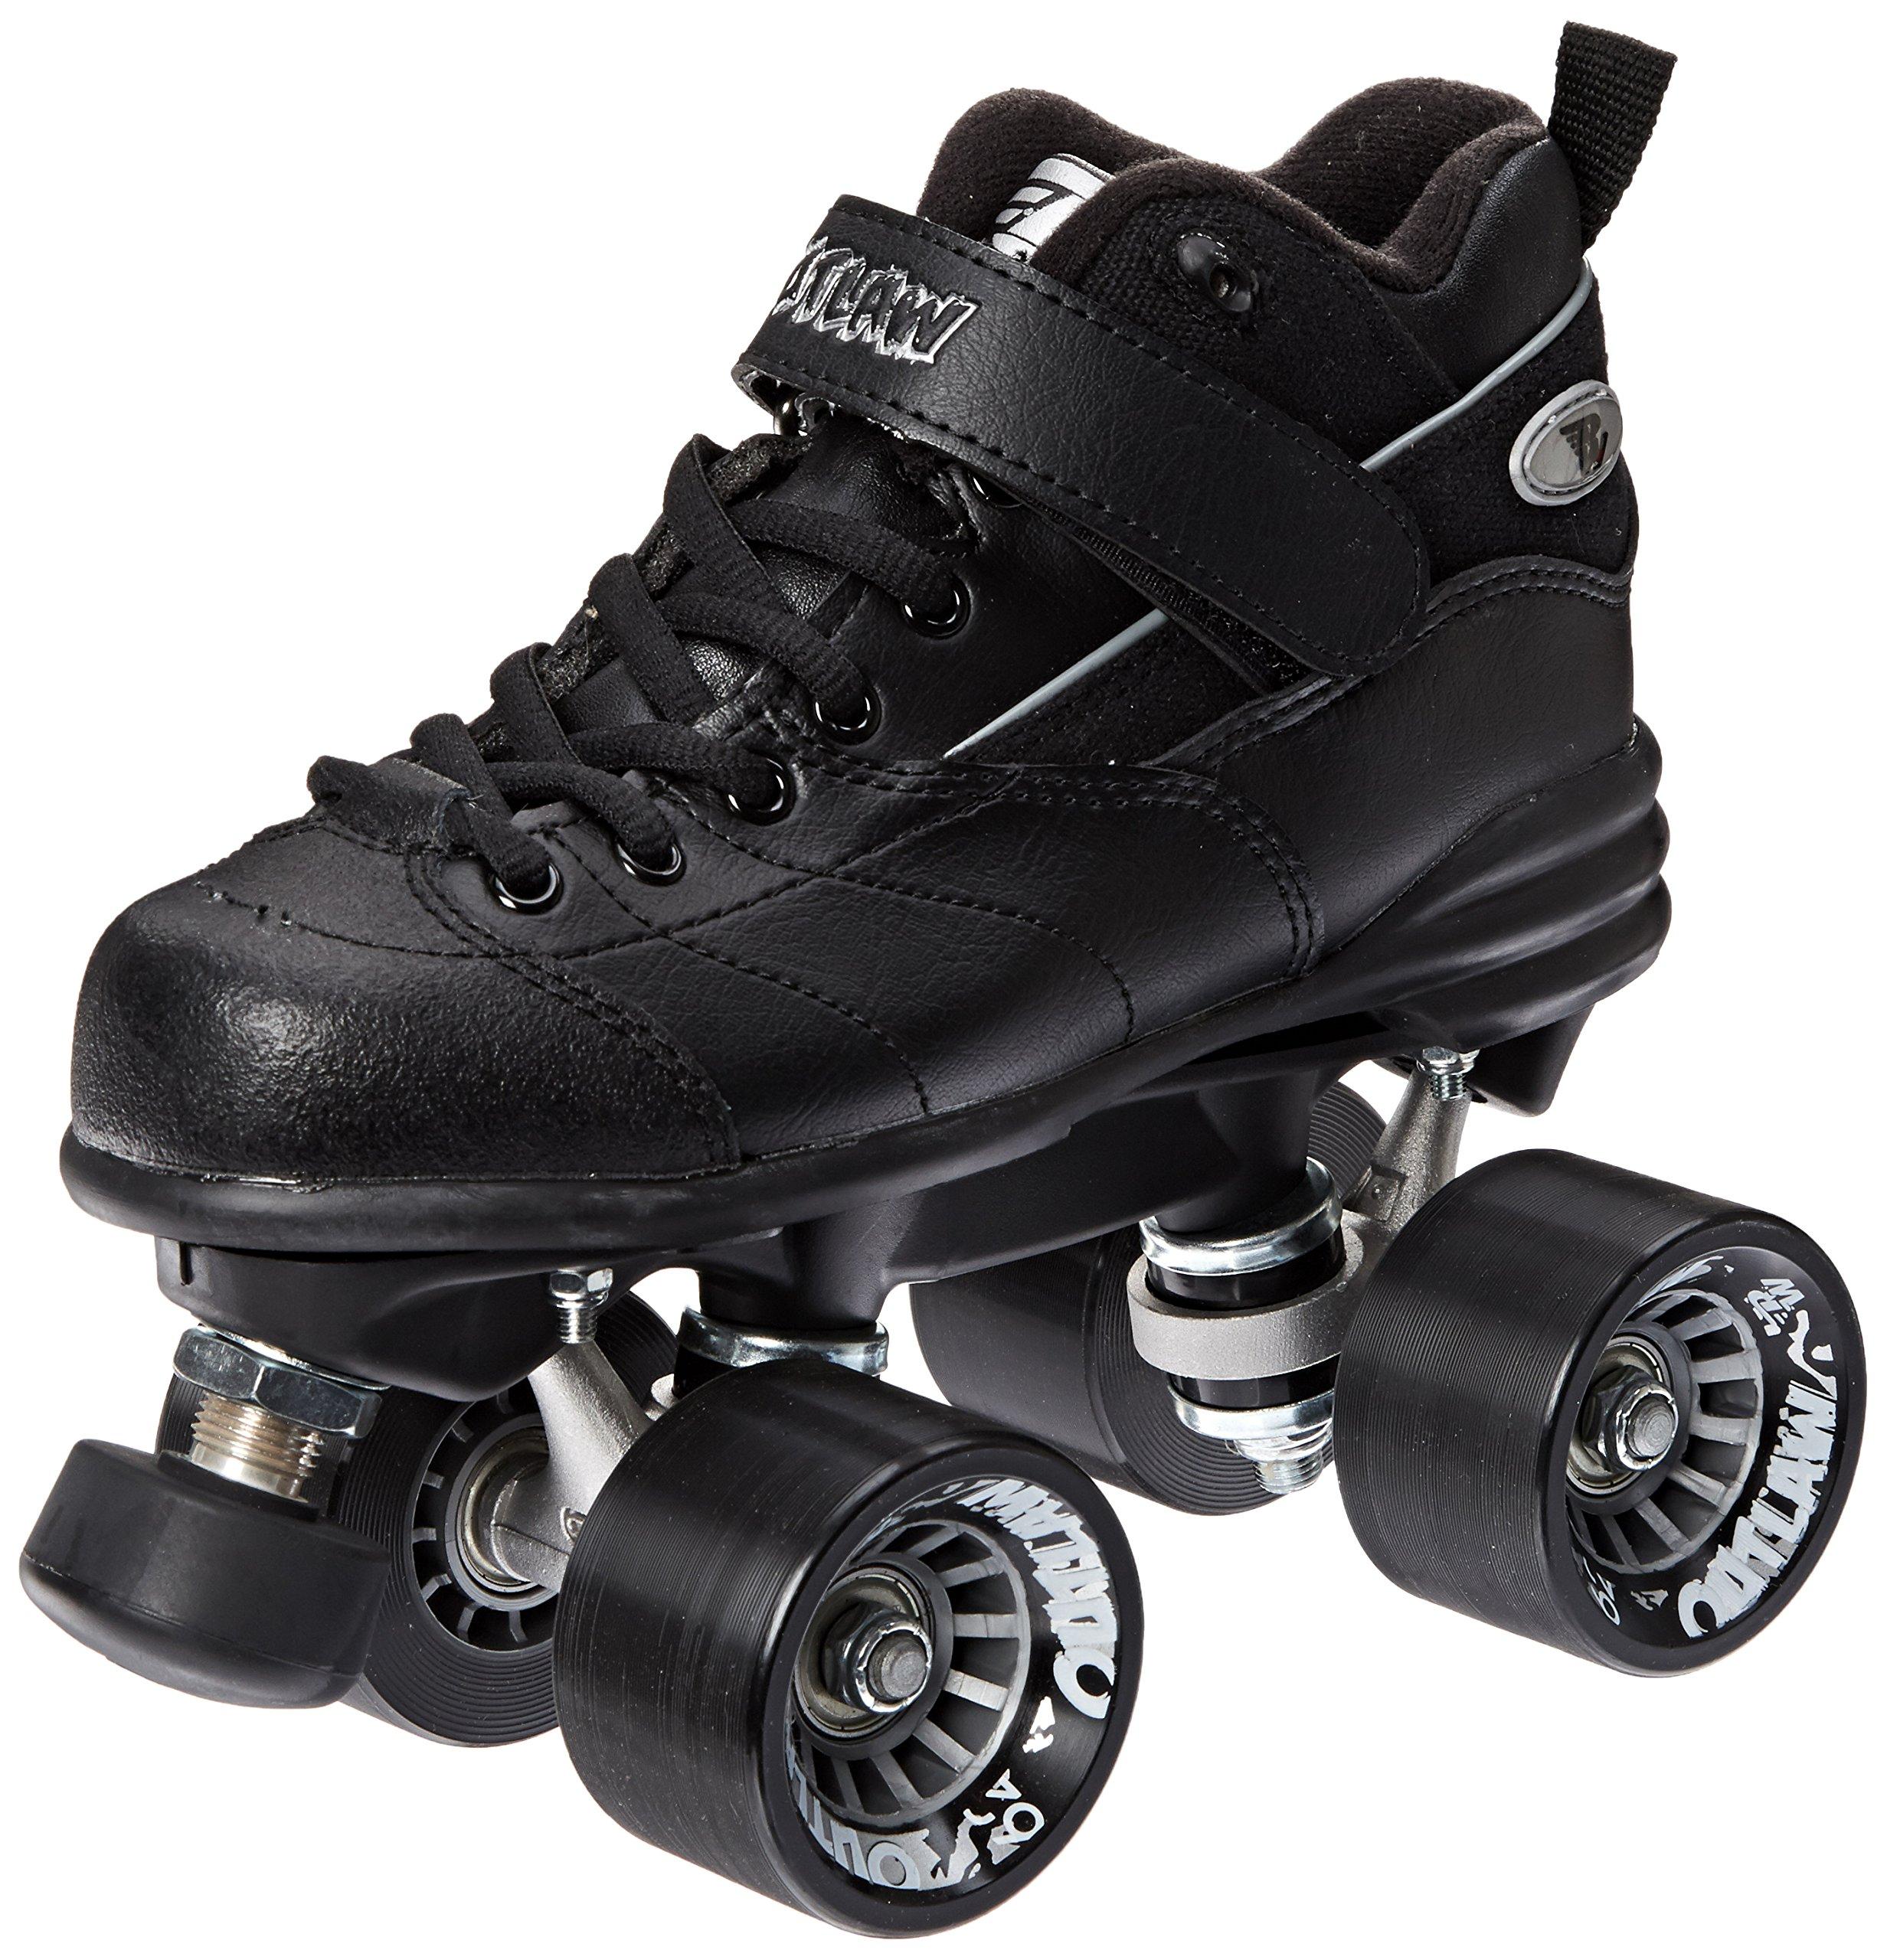 Riedell Skates Outlaw Roller Skate,Black,3 by Riedell